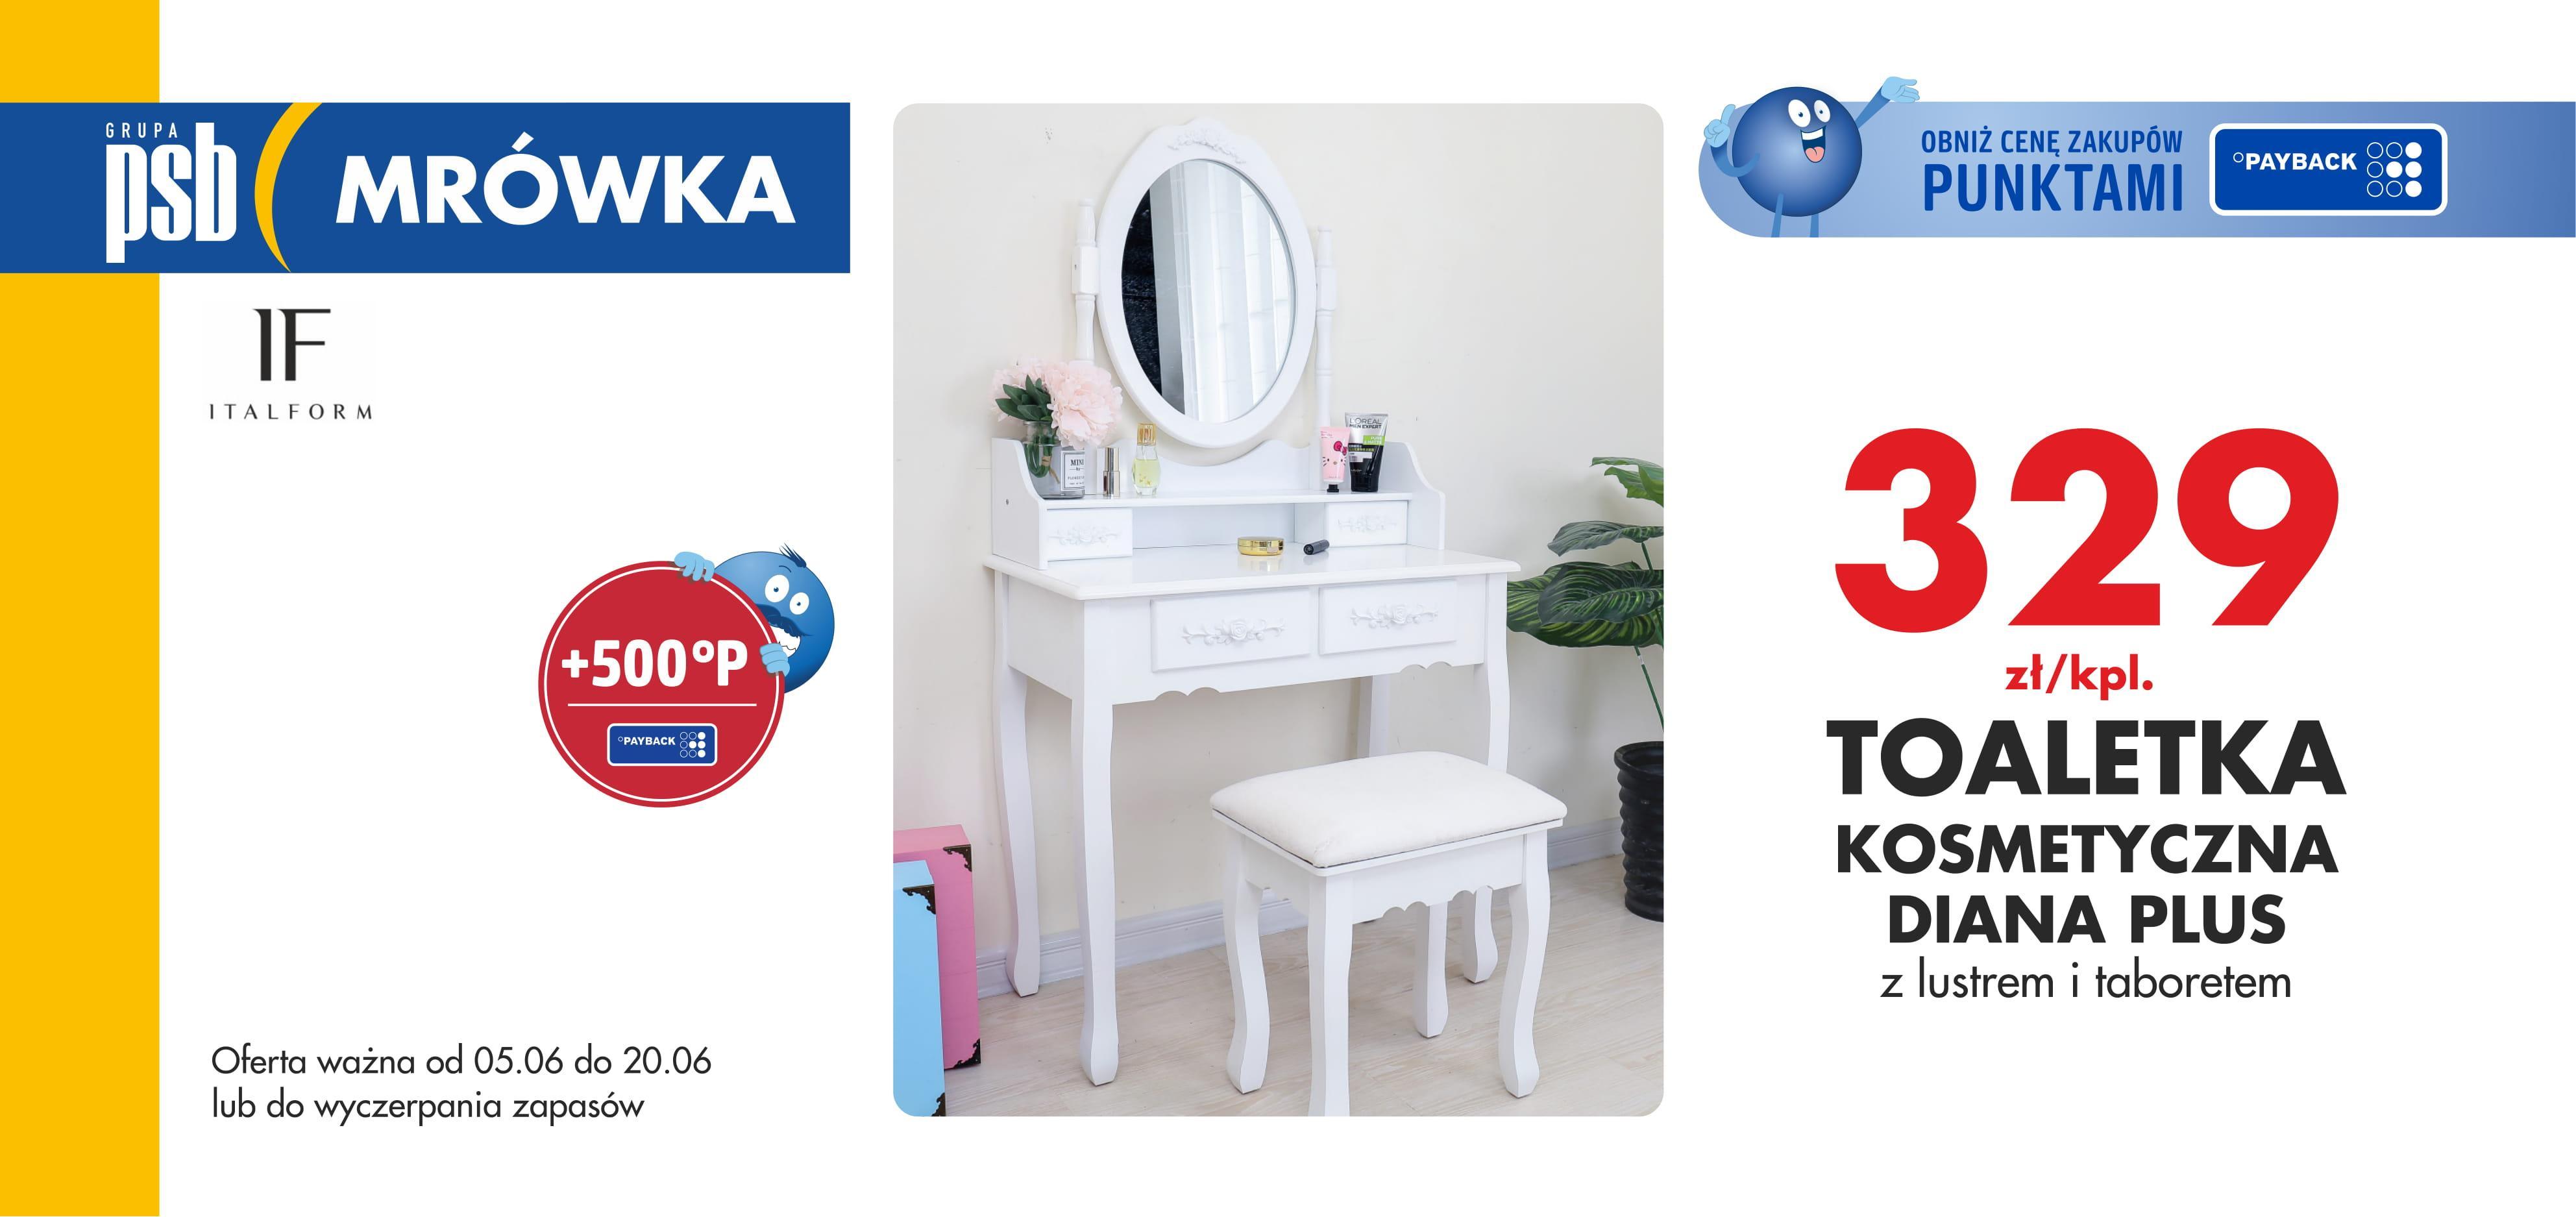 Toaletka-504x238-1